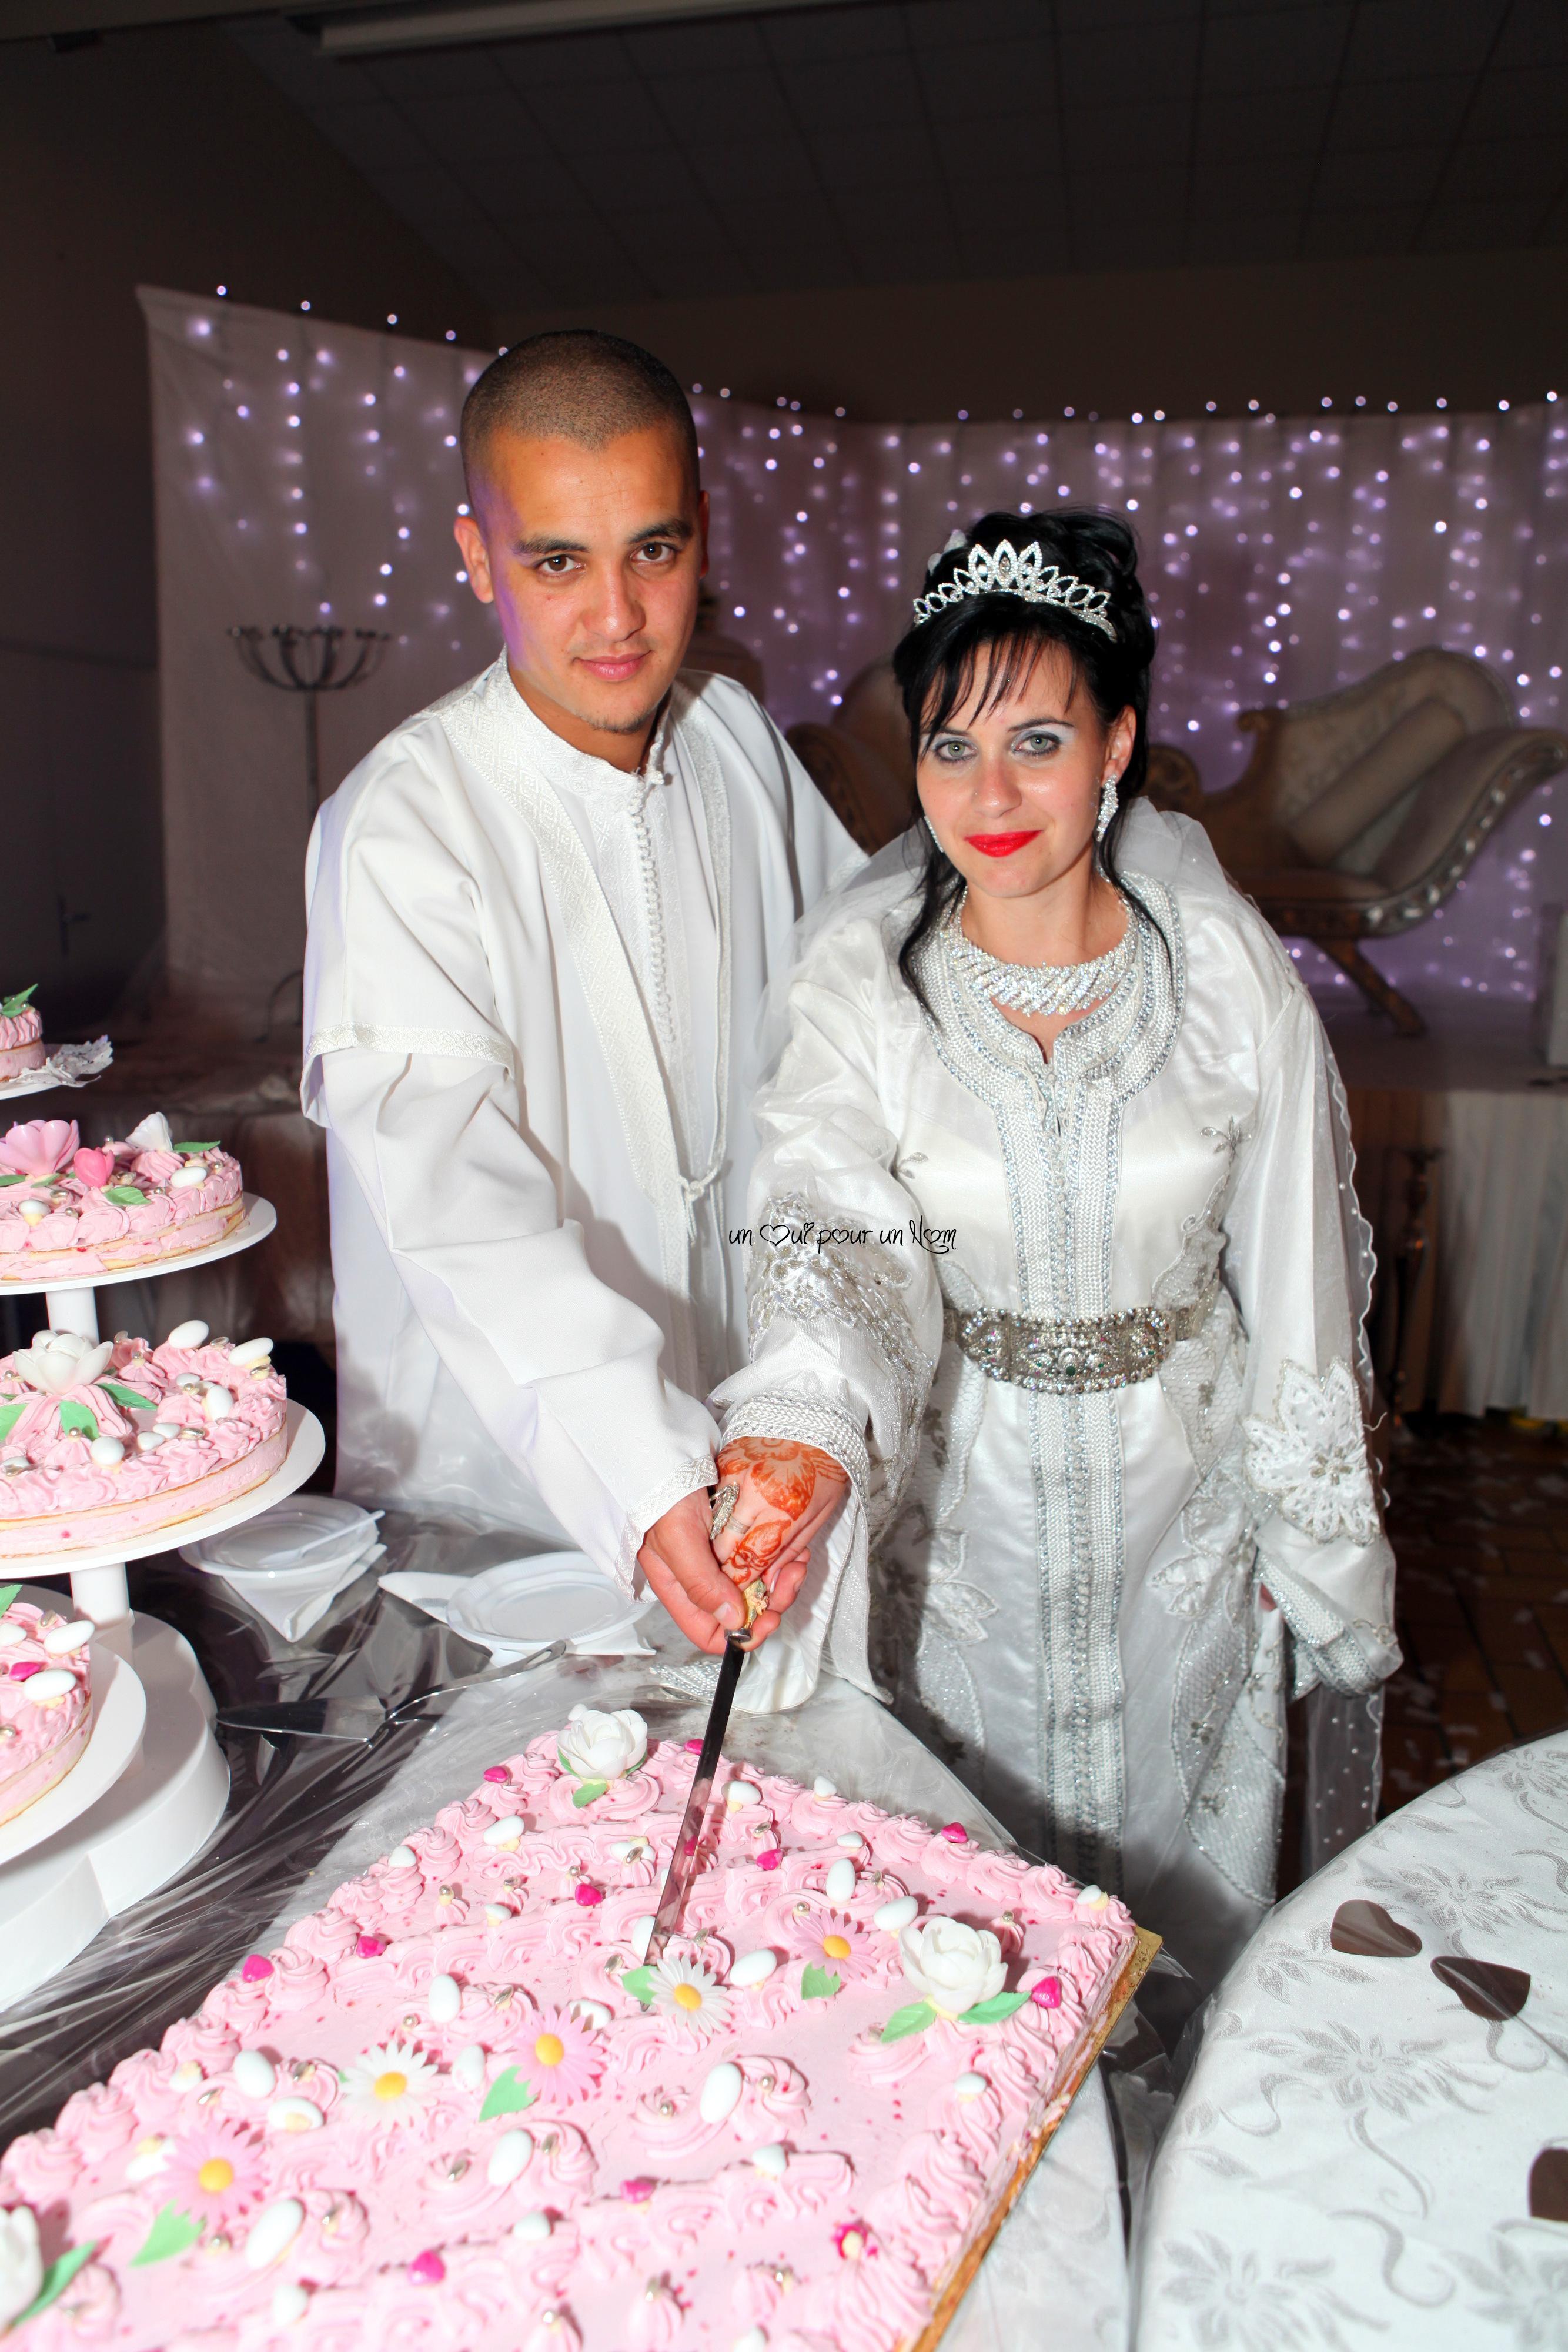 photographe cameraman mariage oriental lyon - Photographe Mariage Oriental